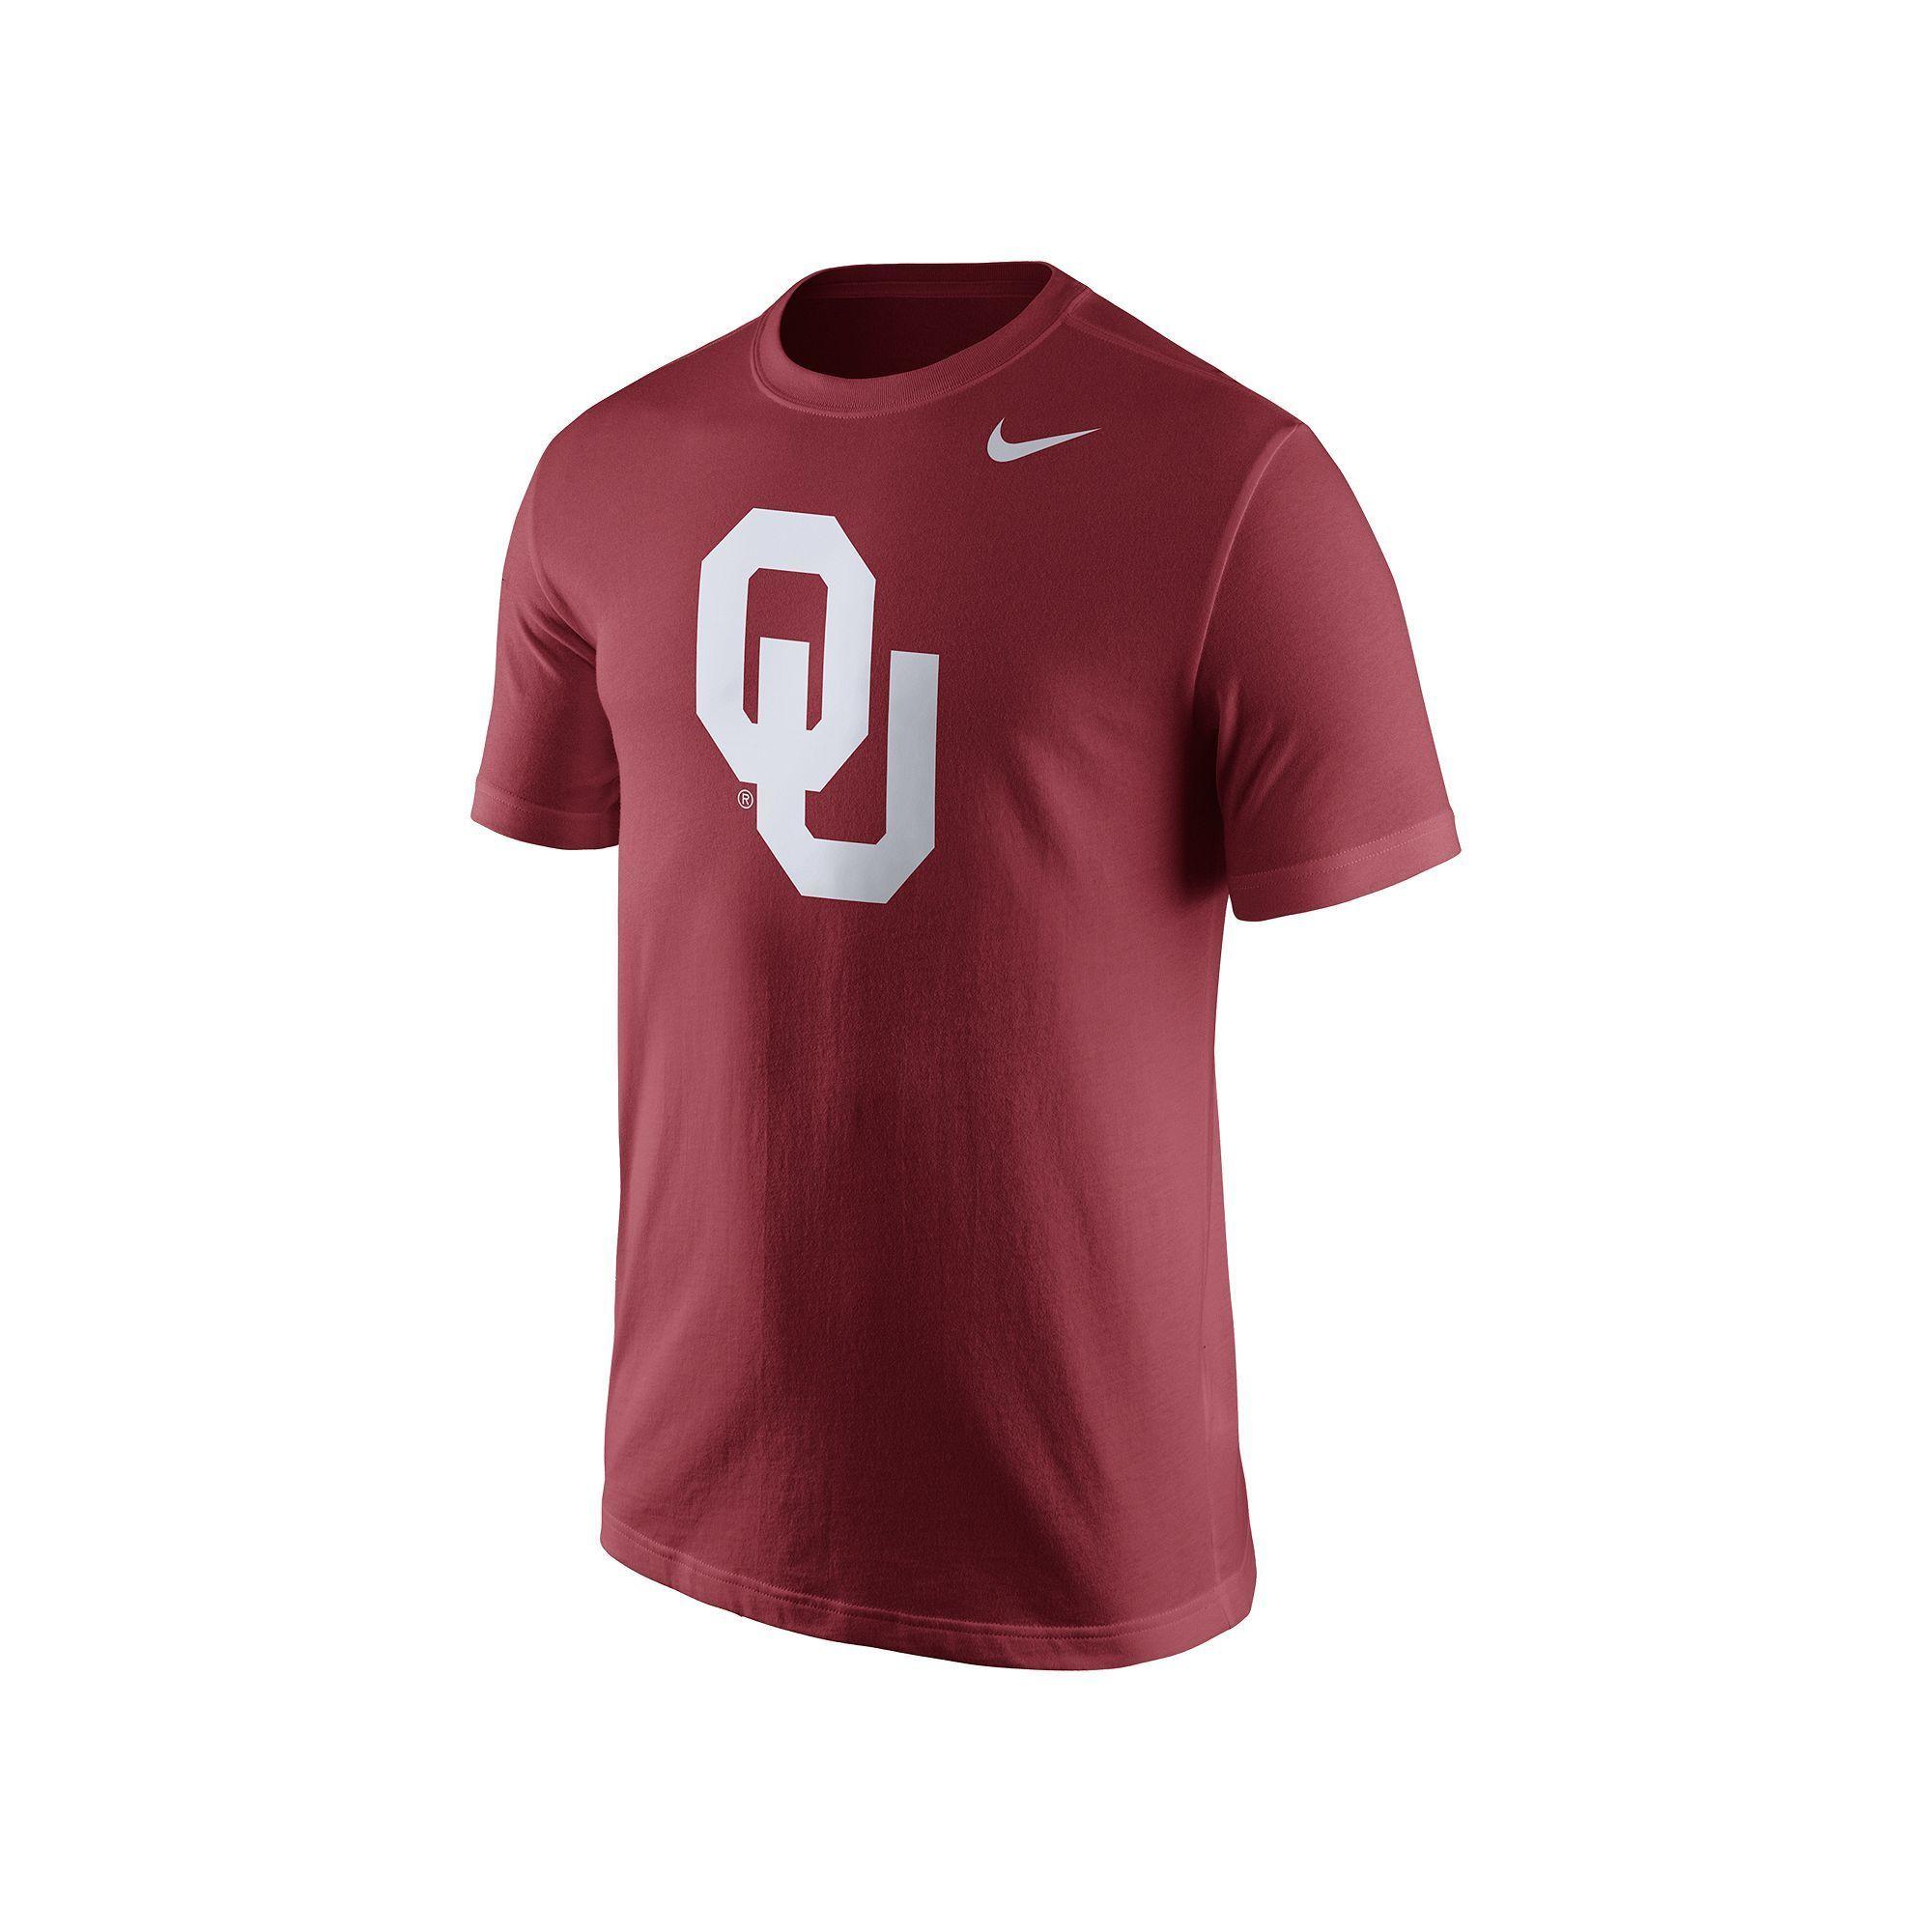 29898667aa Nike Men's Oklahoma Sooners Logo Tee | Oklahoma sooners and Products